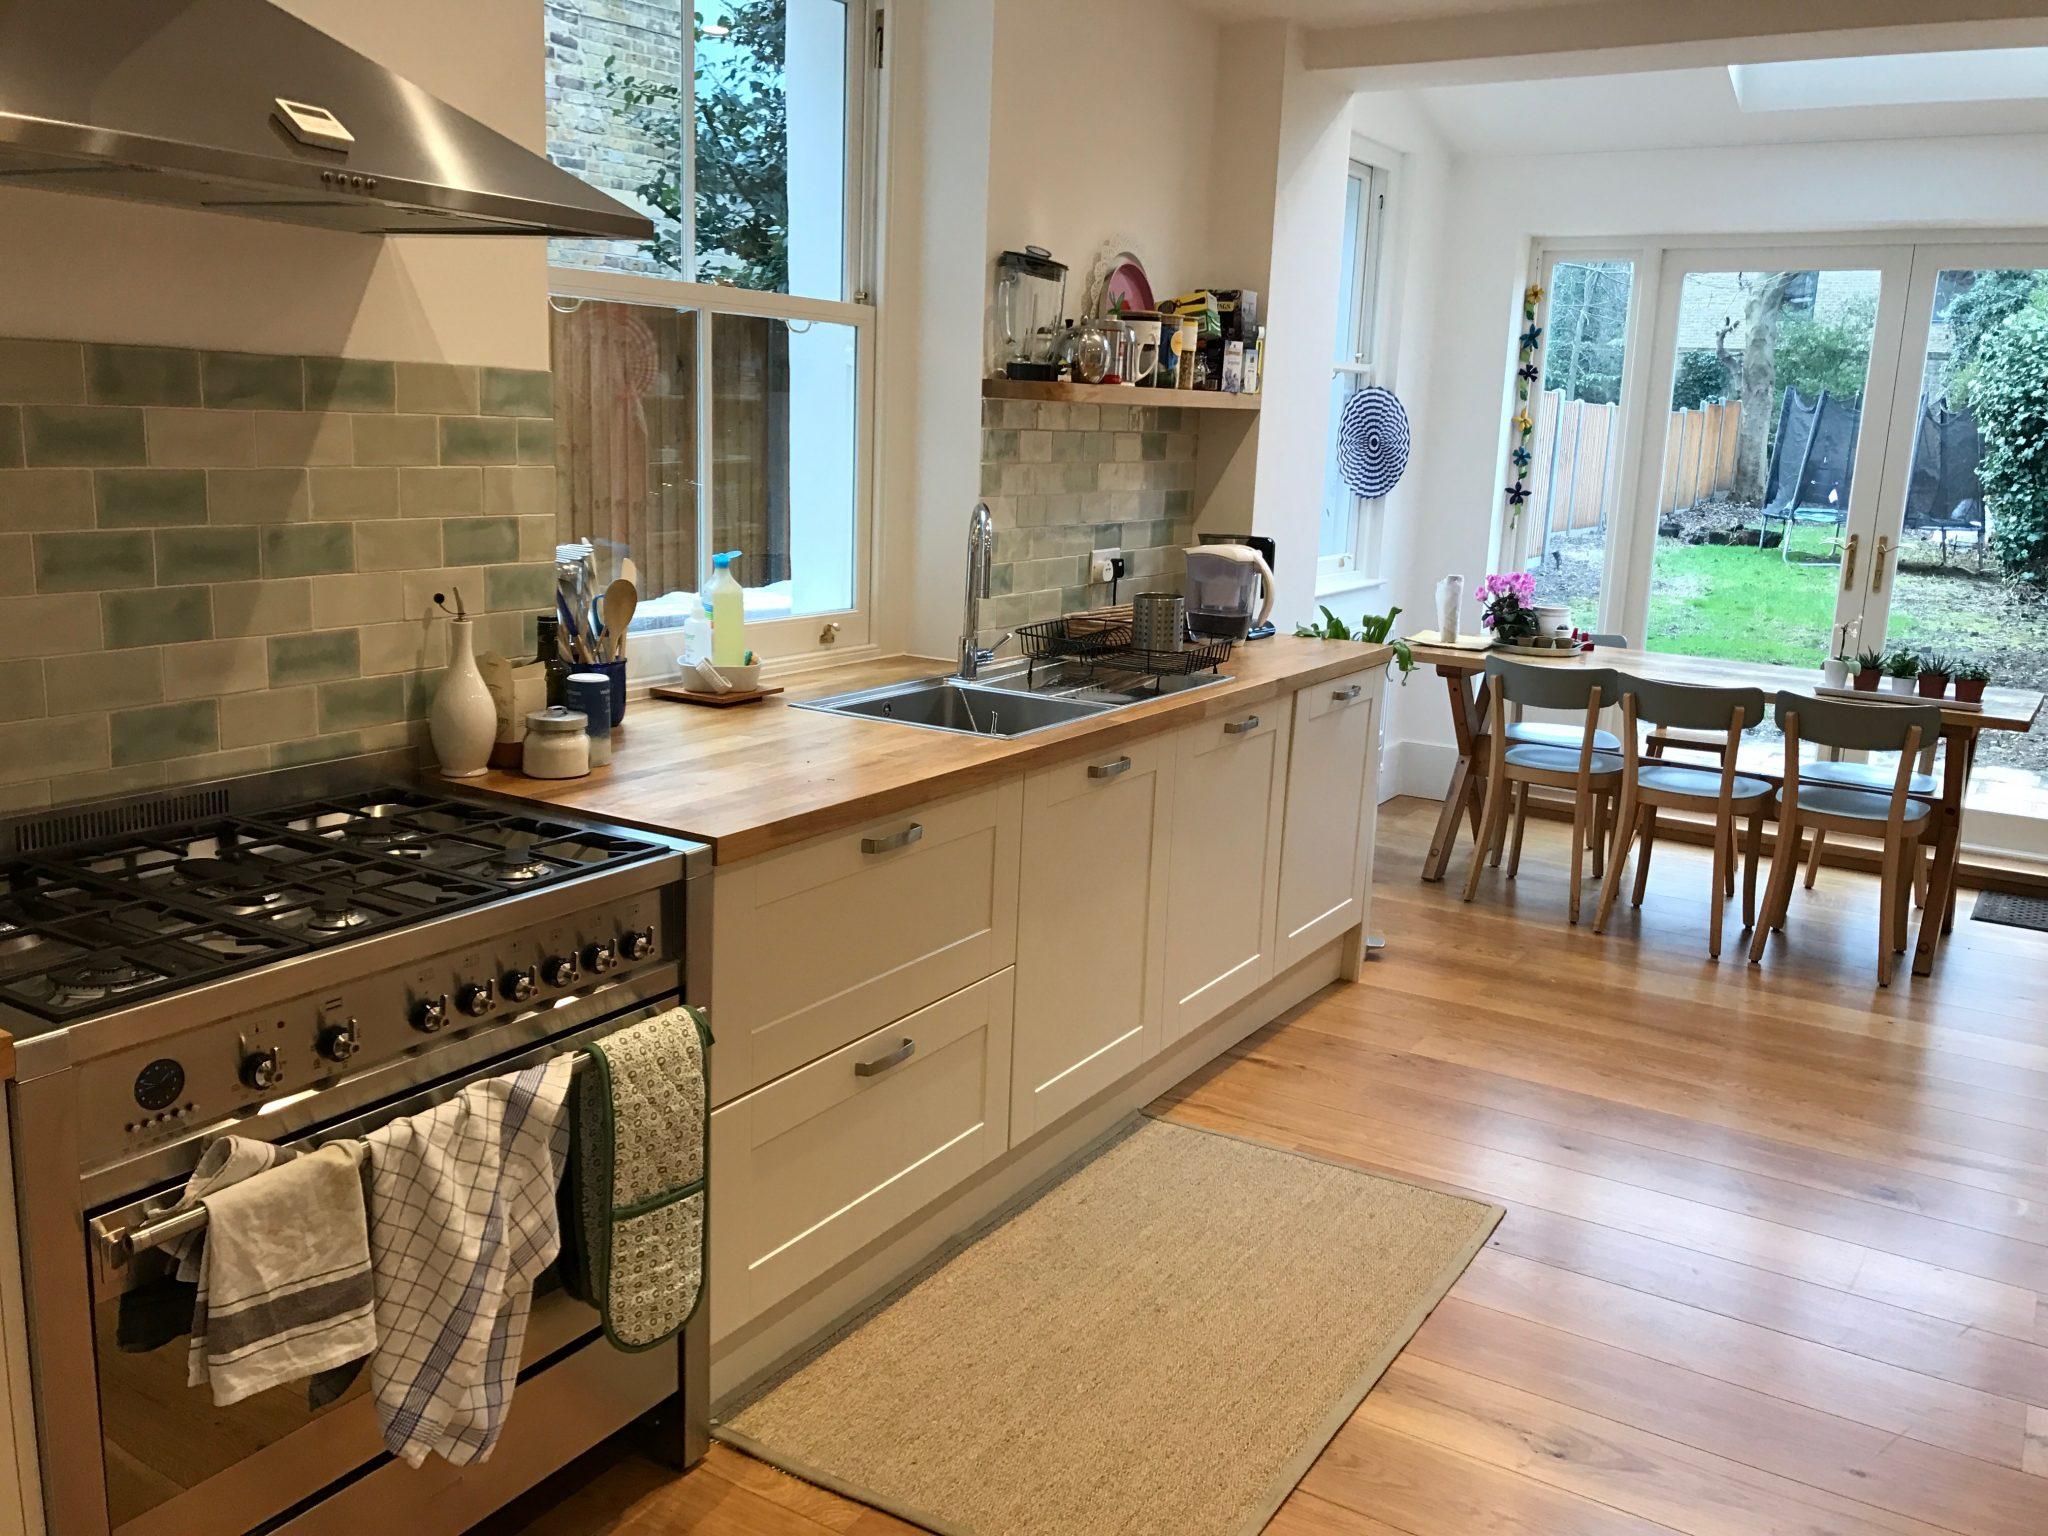 IMG 1166 - Kitchens